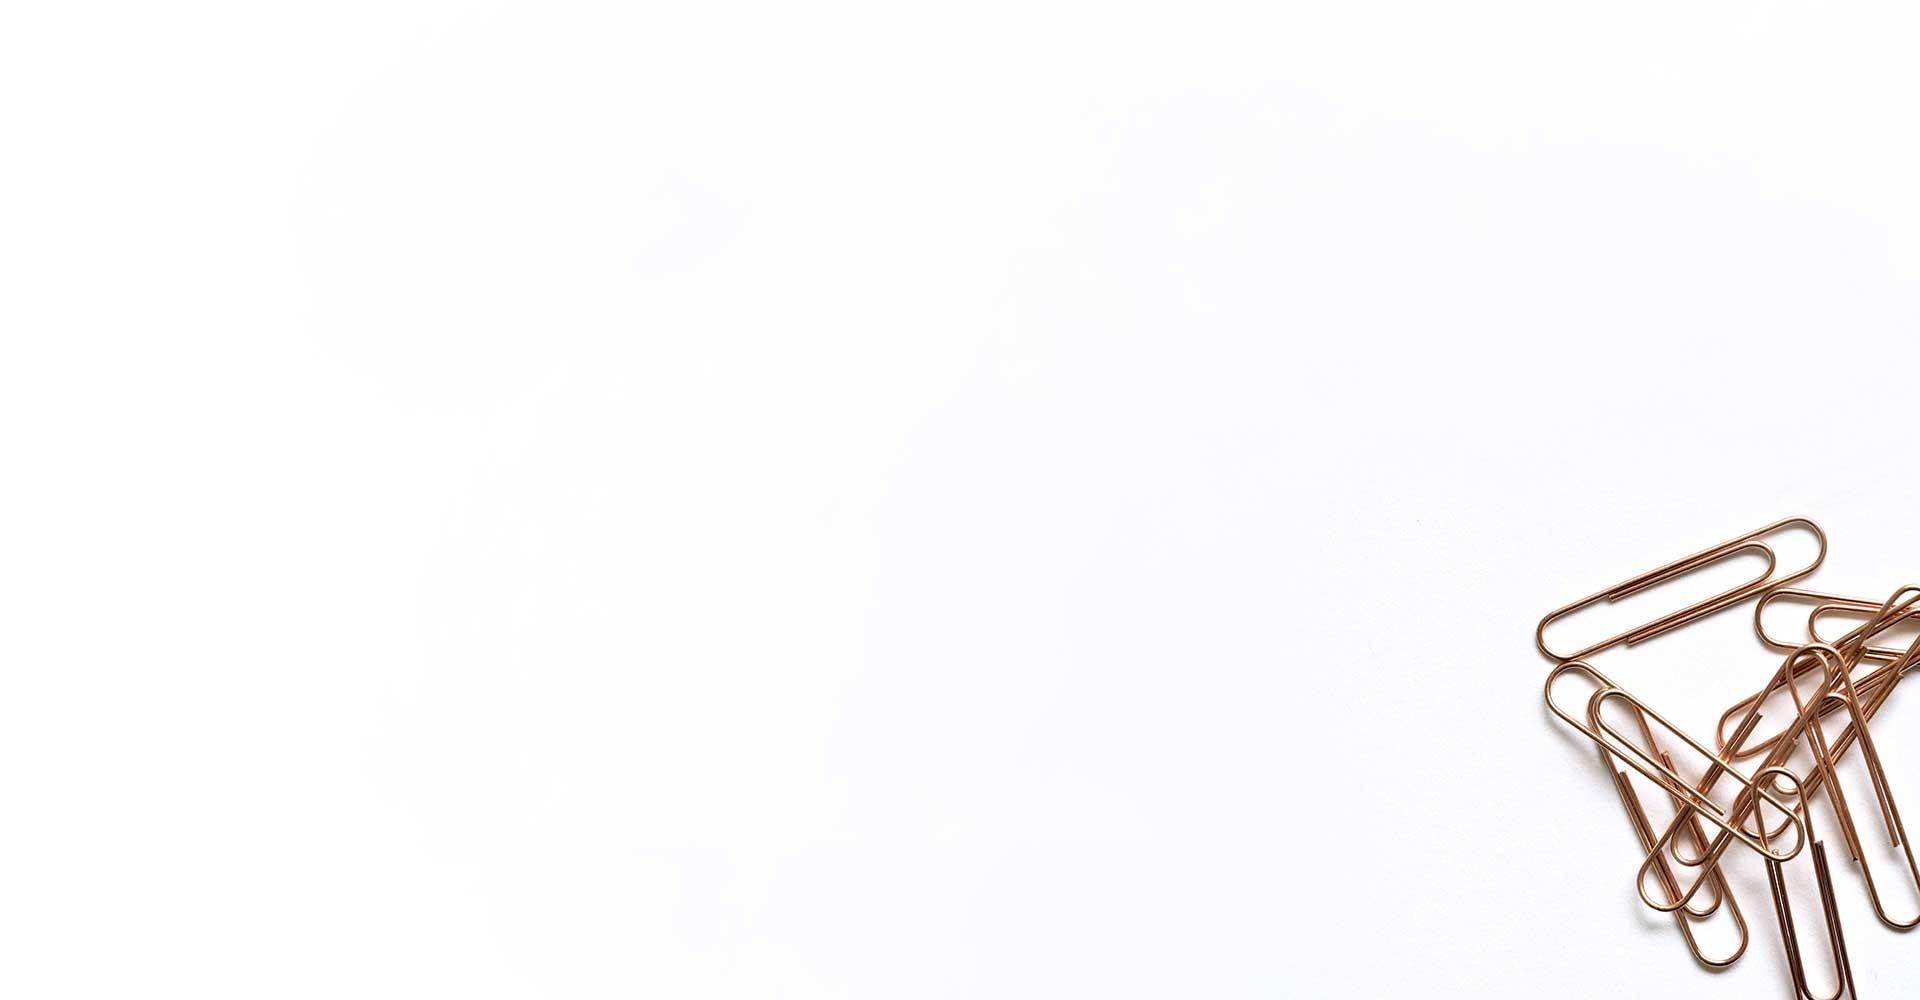 paperclips-rechtsonder-1920-1000px